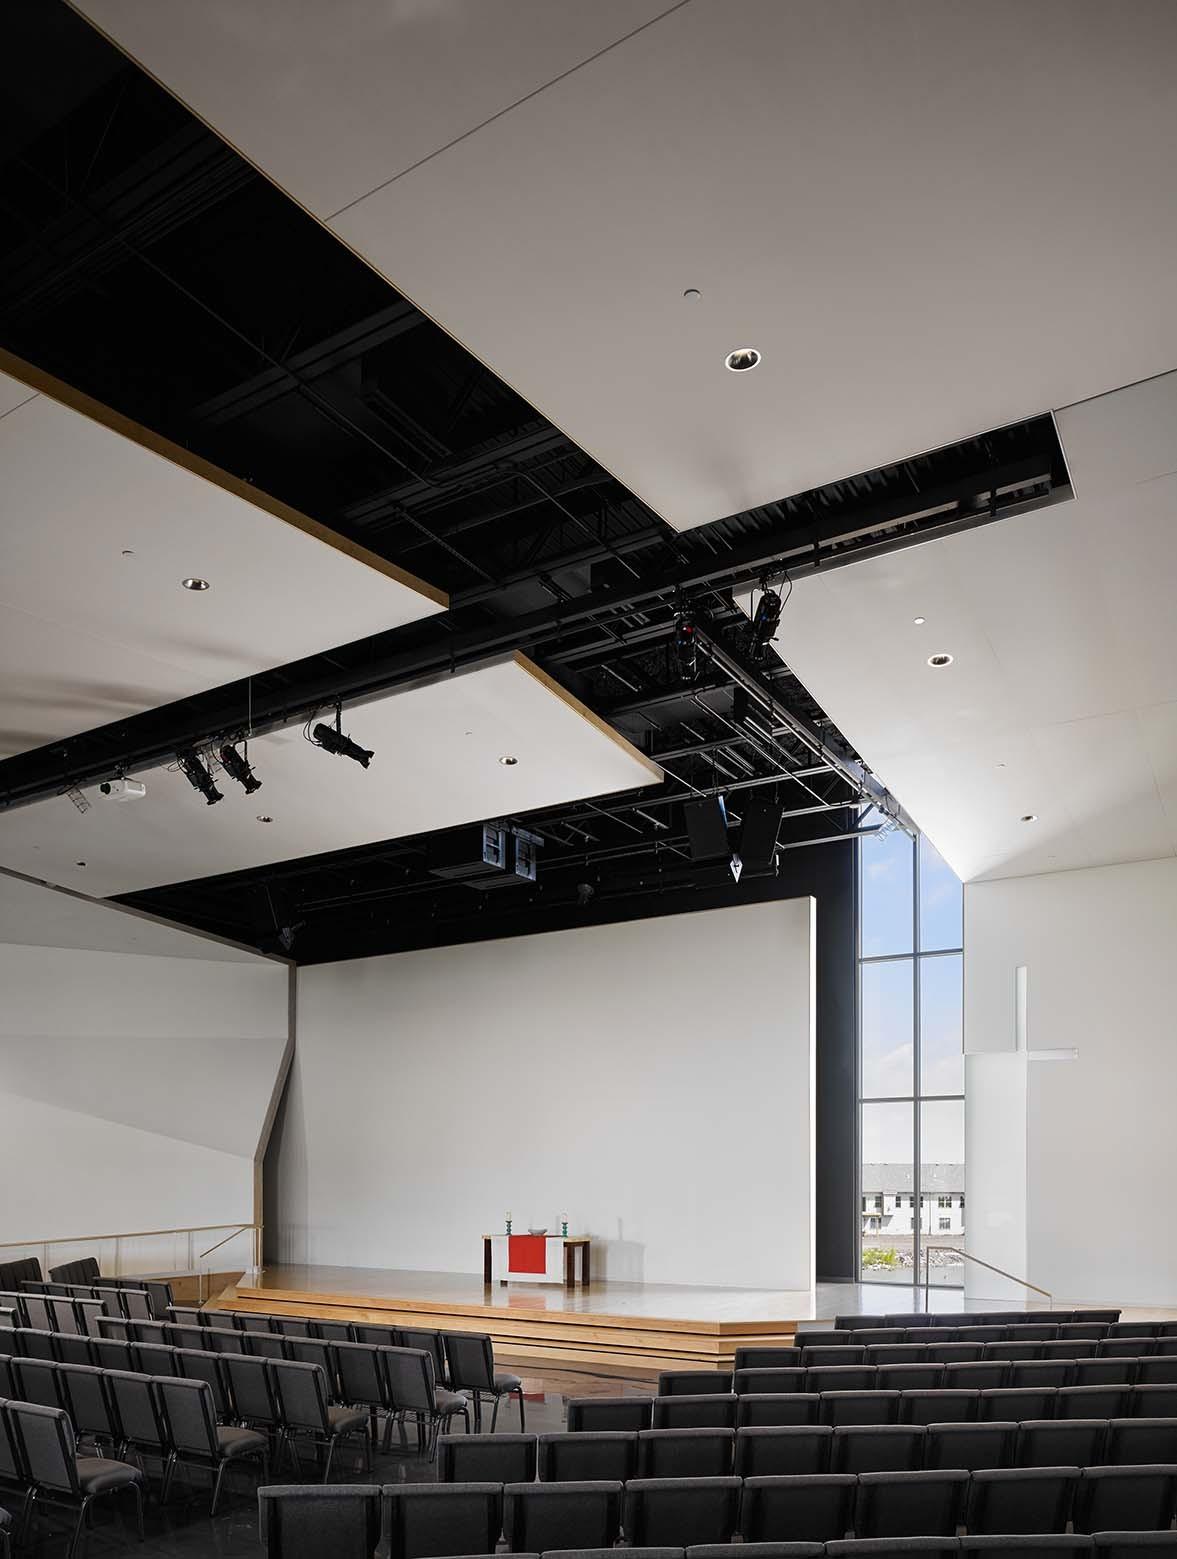 Good Hope Lutheran Church #1: BNIM-Hope-063852_014.jpg?1455857633